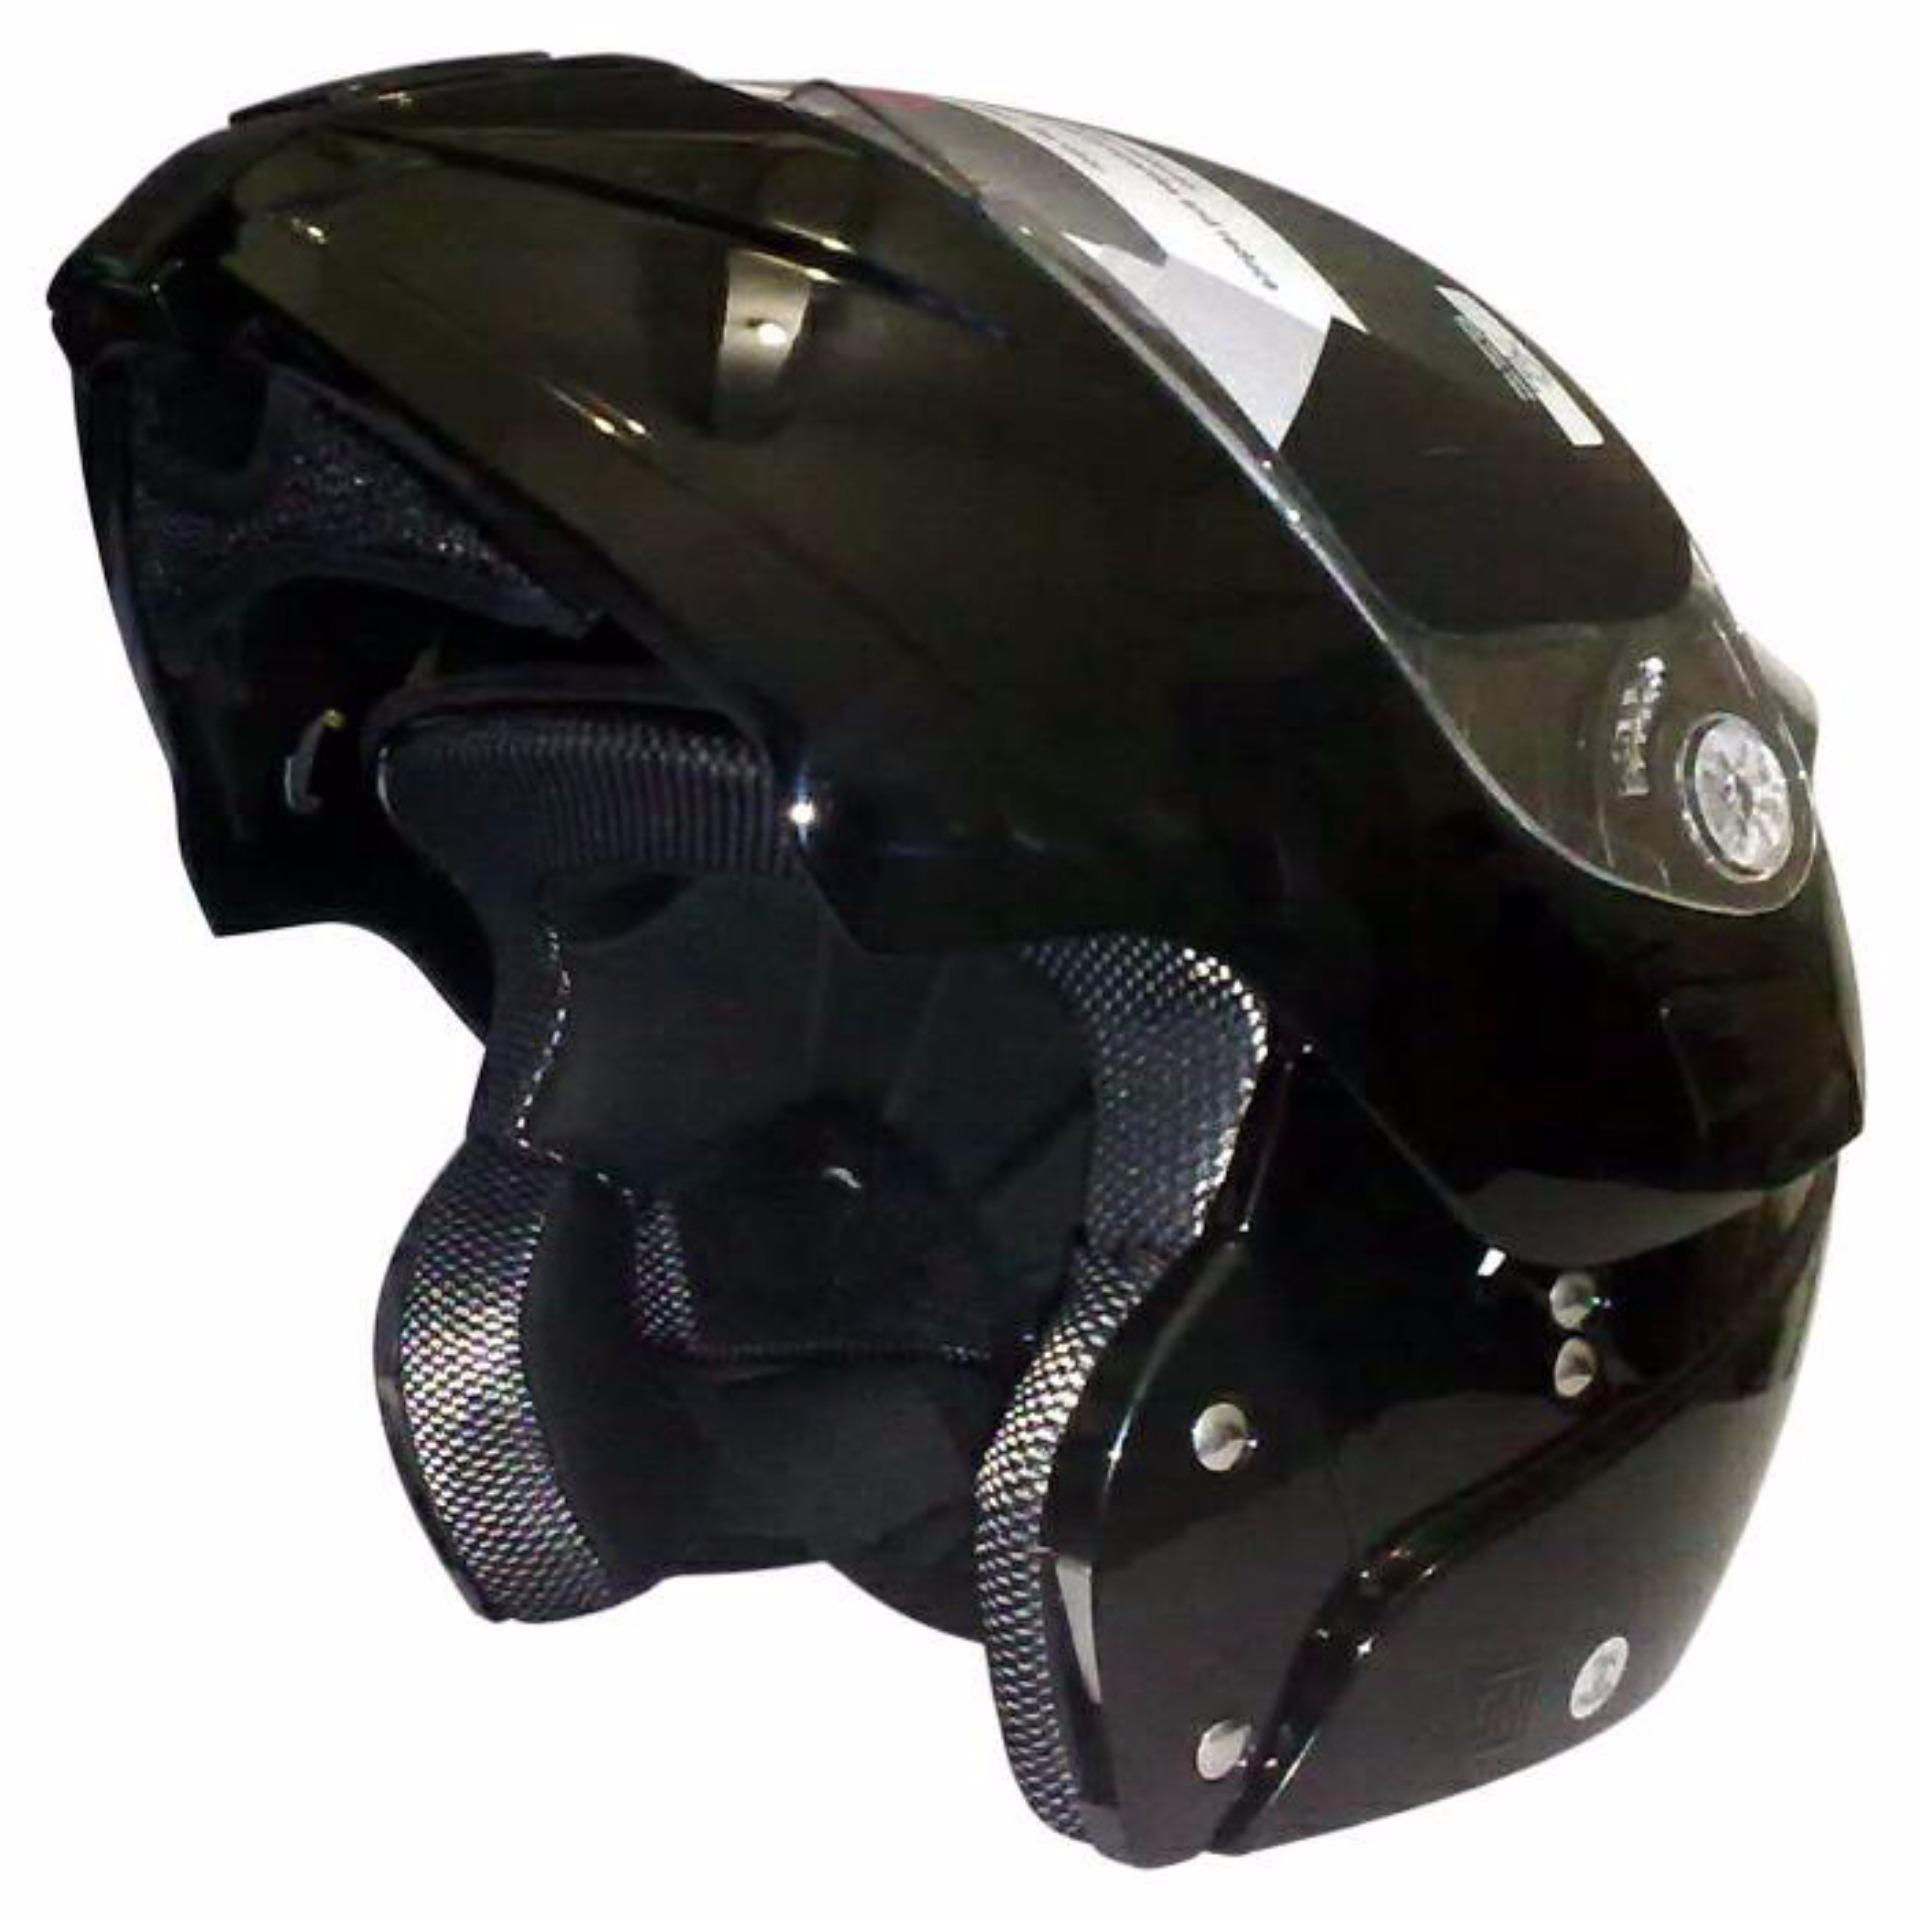 Snail Helm Half Face Retro 622 Double Visor Mika Panjang Hitam 310 White With Revo Green Modular Single Ff831 Putih